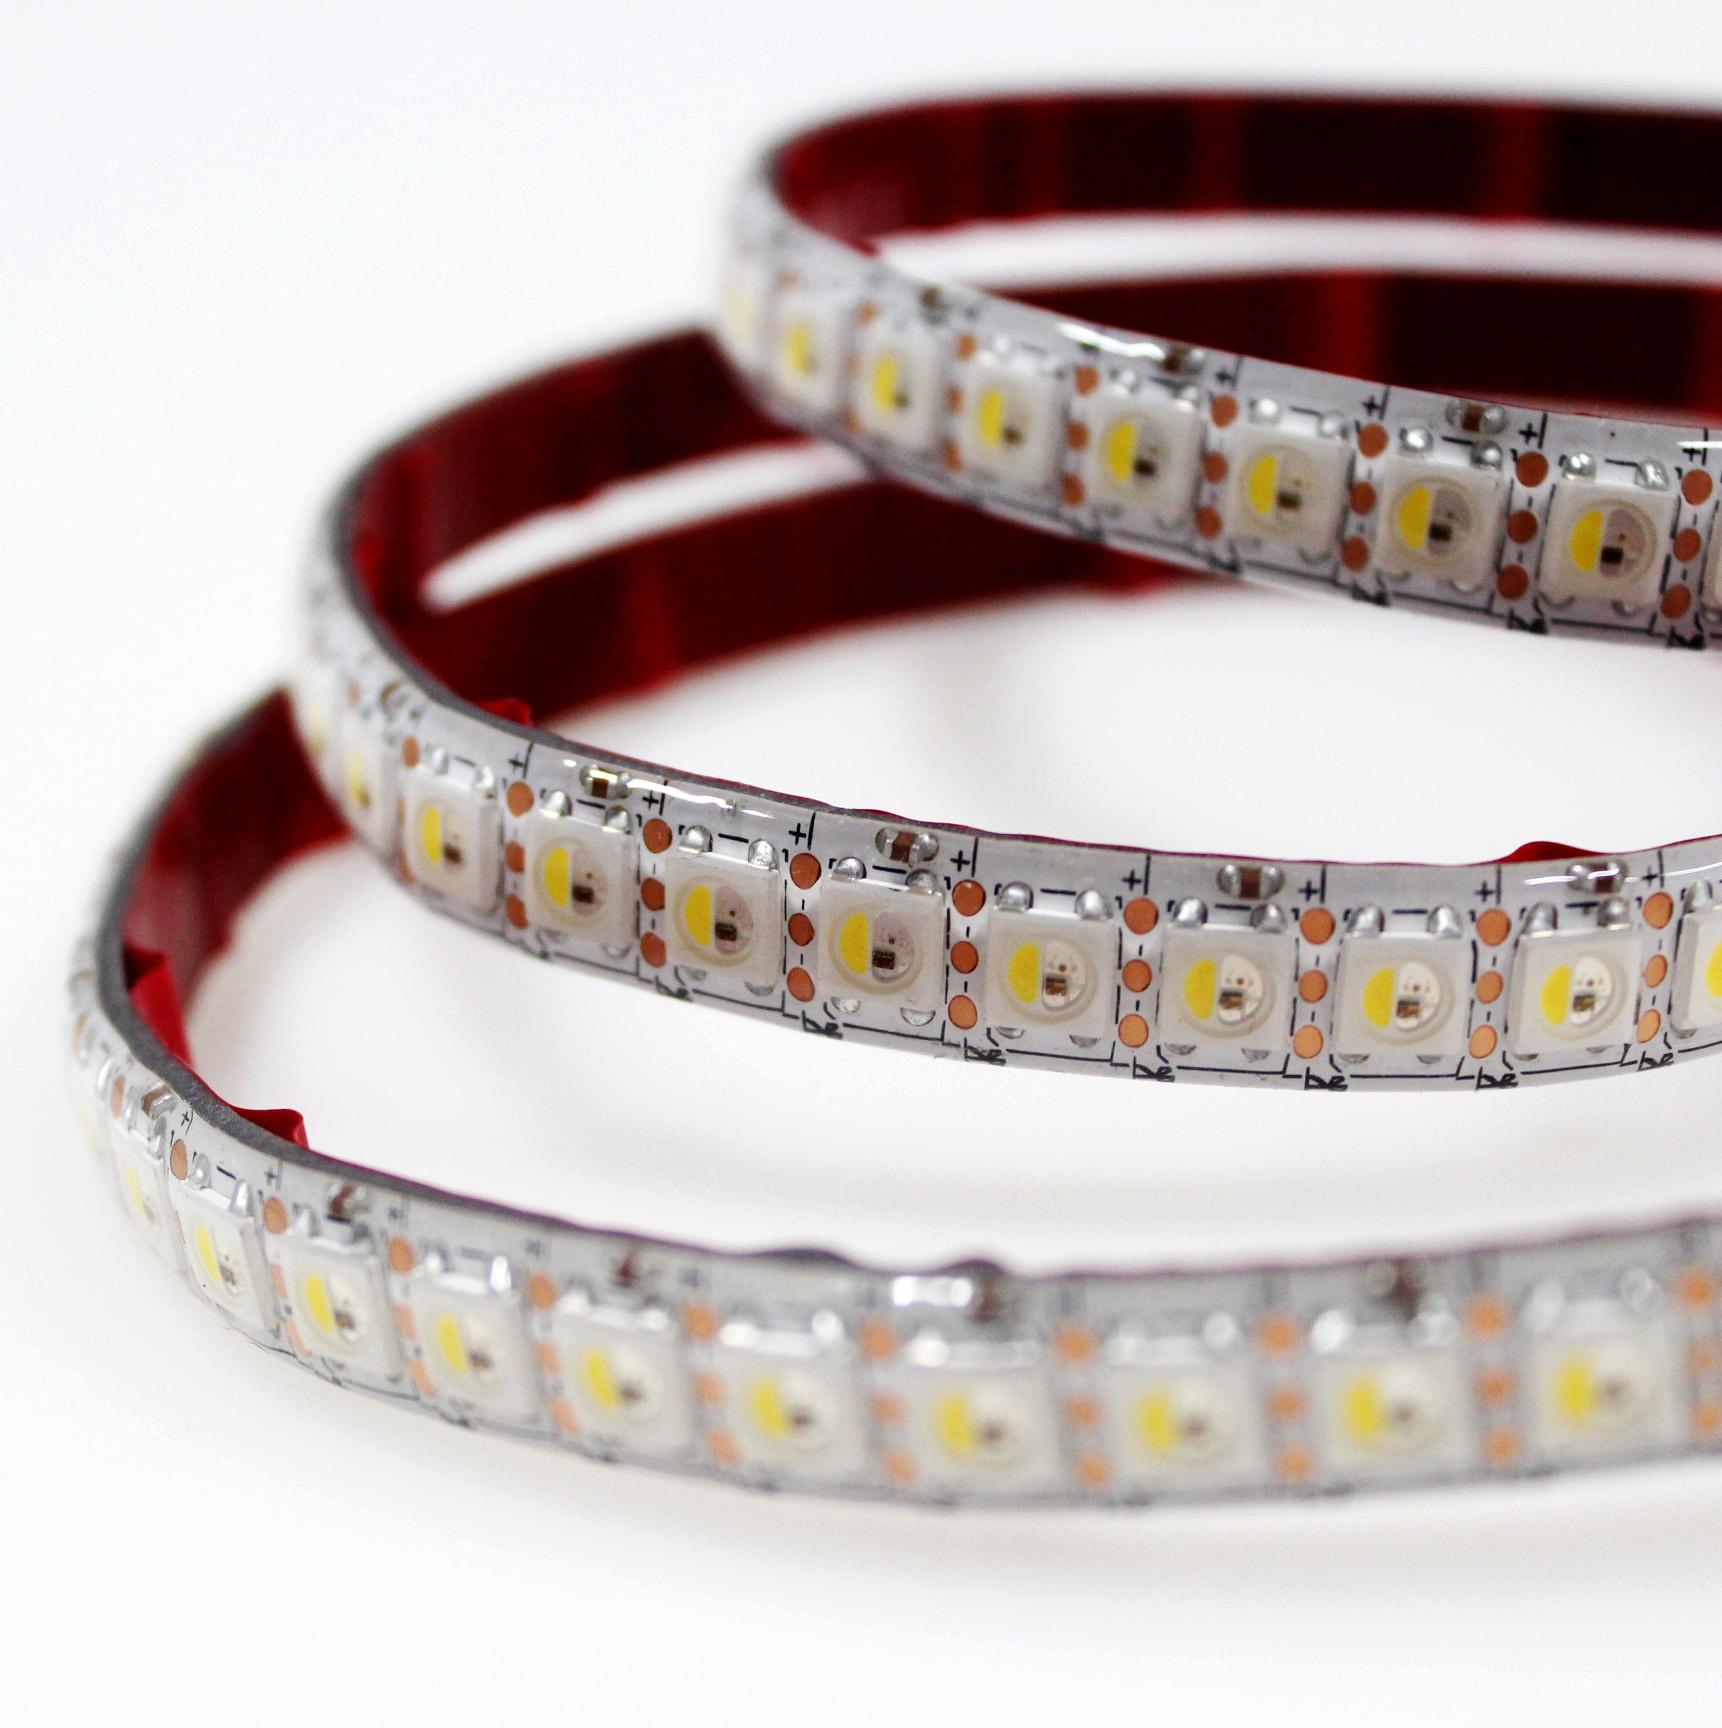 Online retail 144leds sk6812 light individually addressable 5v rgbw led strip